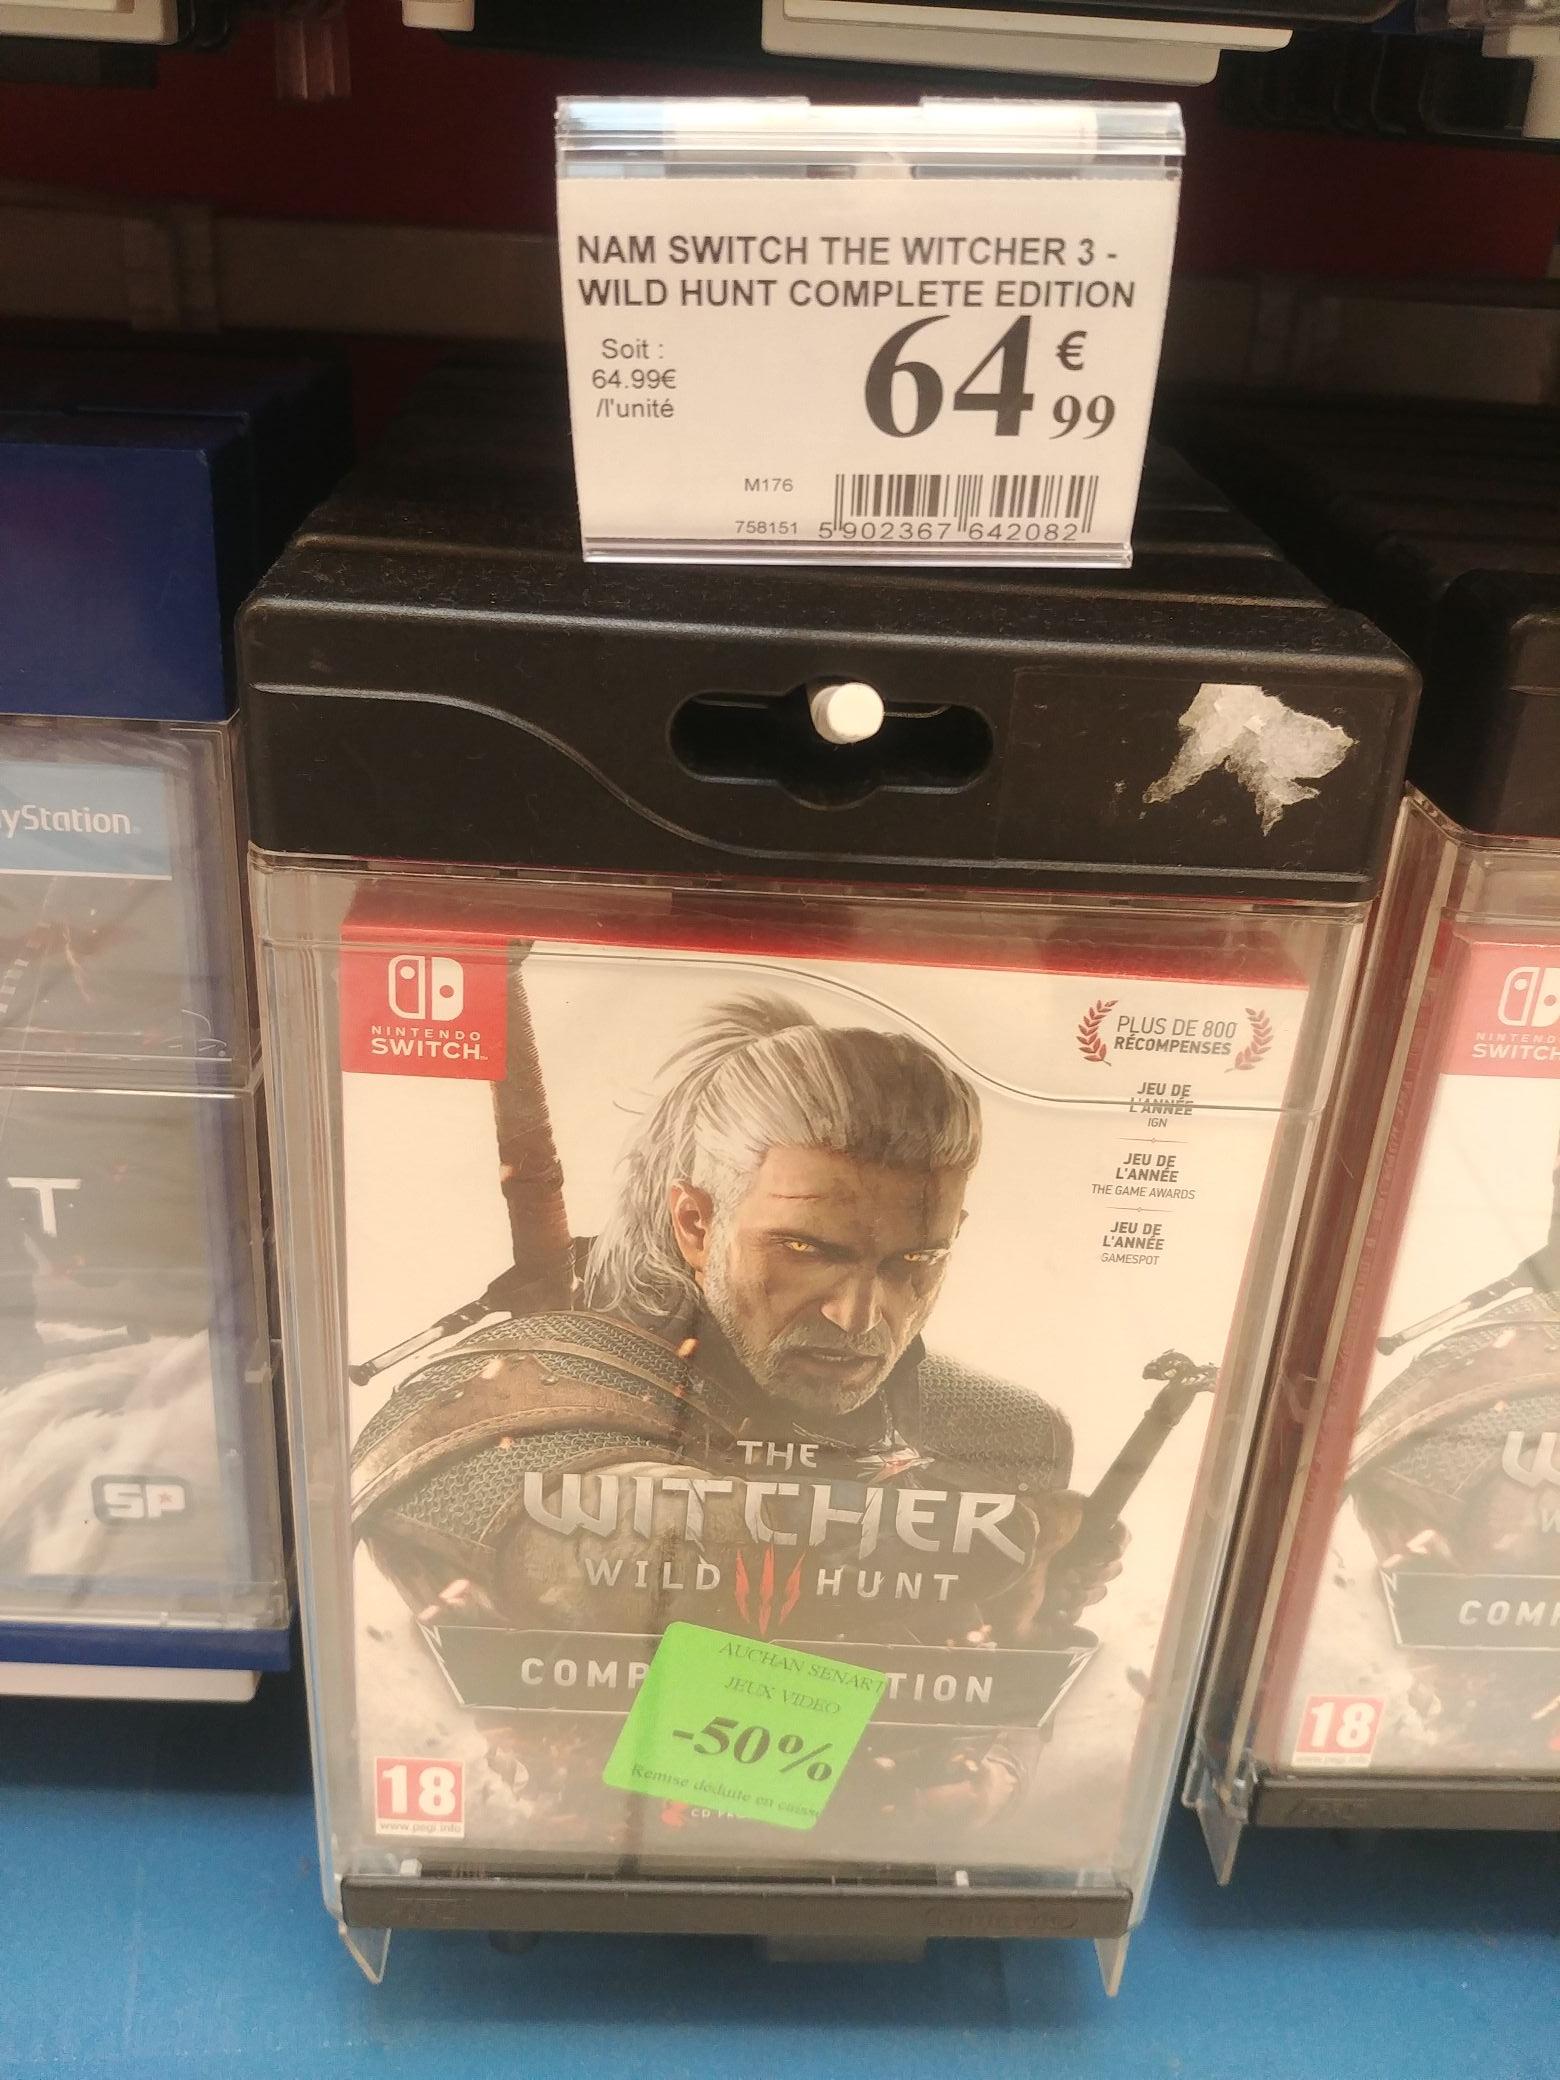 The Witcher 3 : Wild Hunt - Édition Complete sur Switch - Cesson (77)